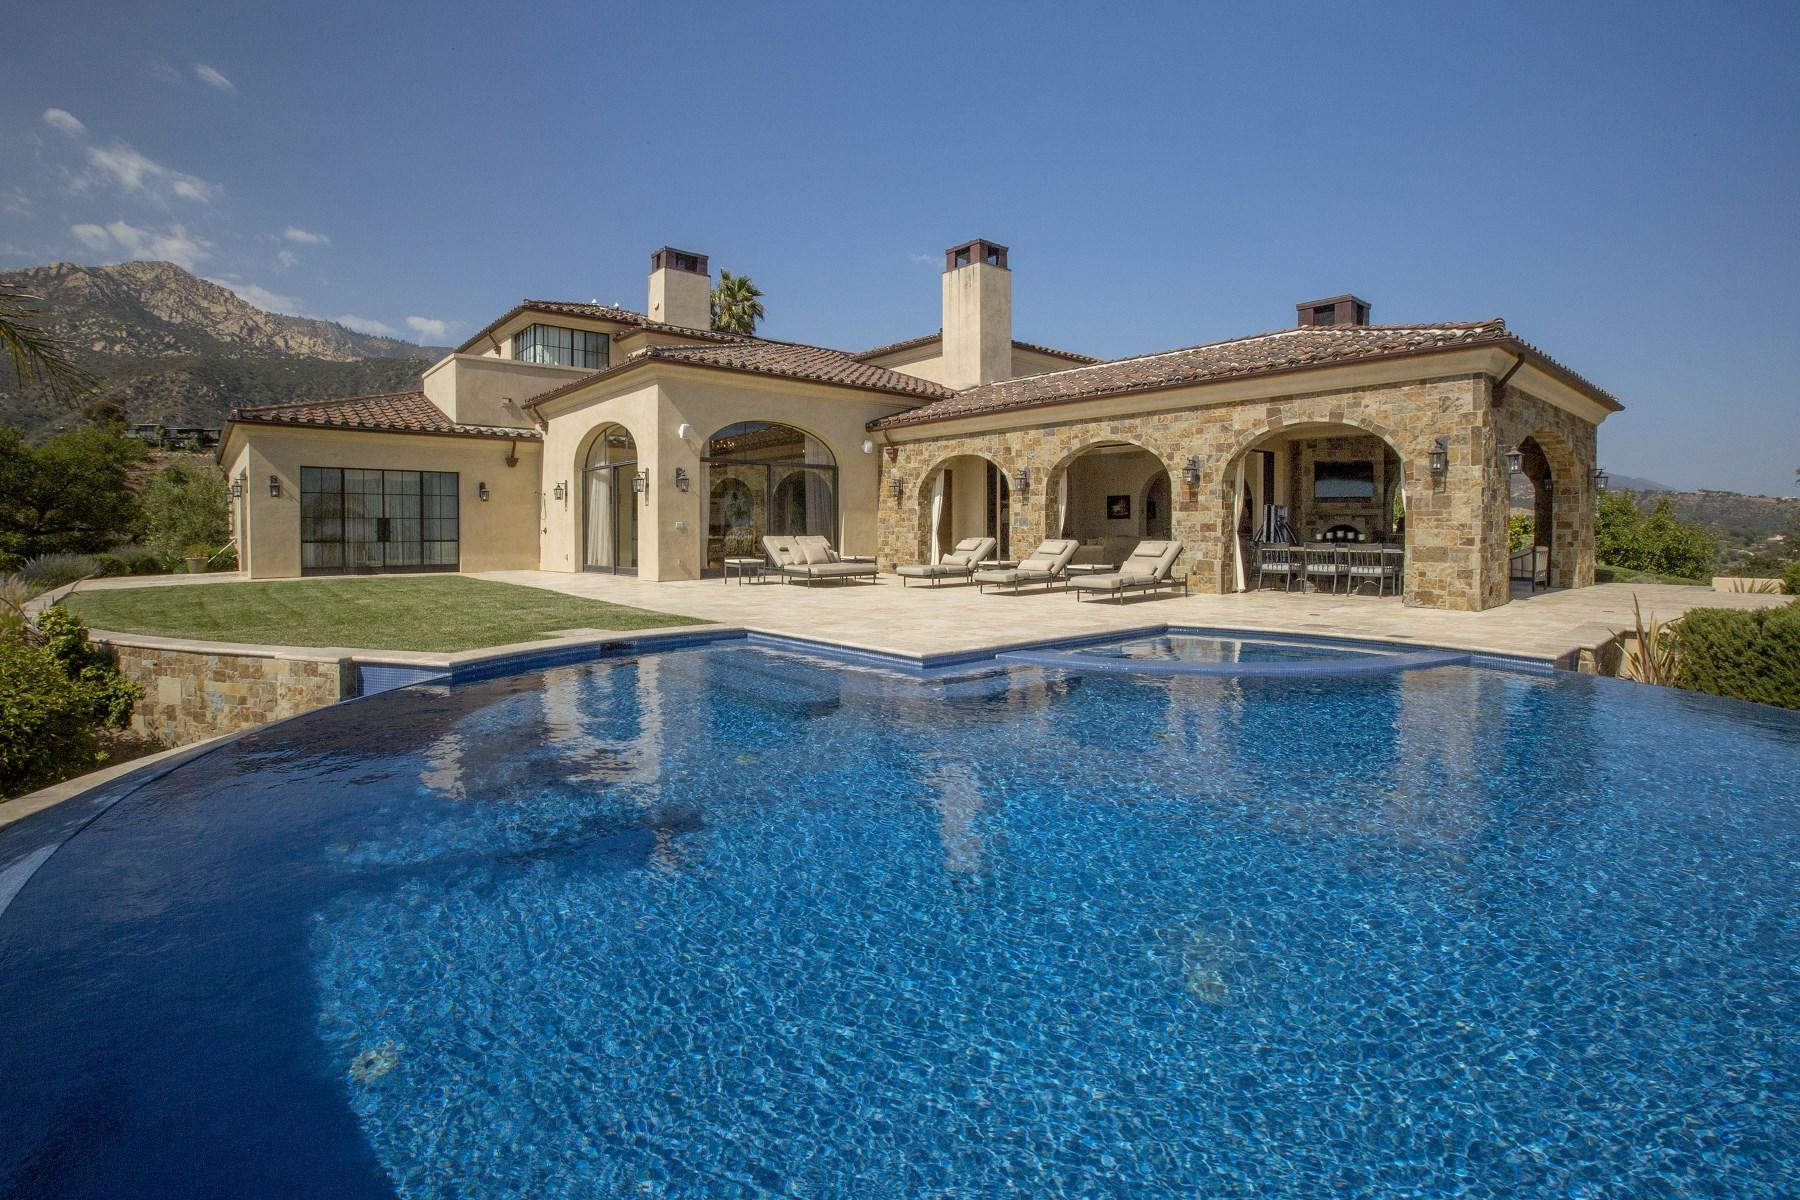 Single Family Home for Sale at Santa Barbara Italian Villa 2809 Holly Road Santa Barbara, California, 93105 United States